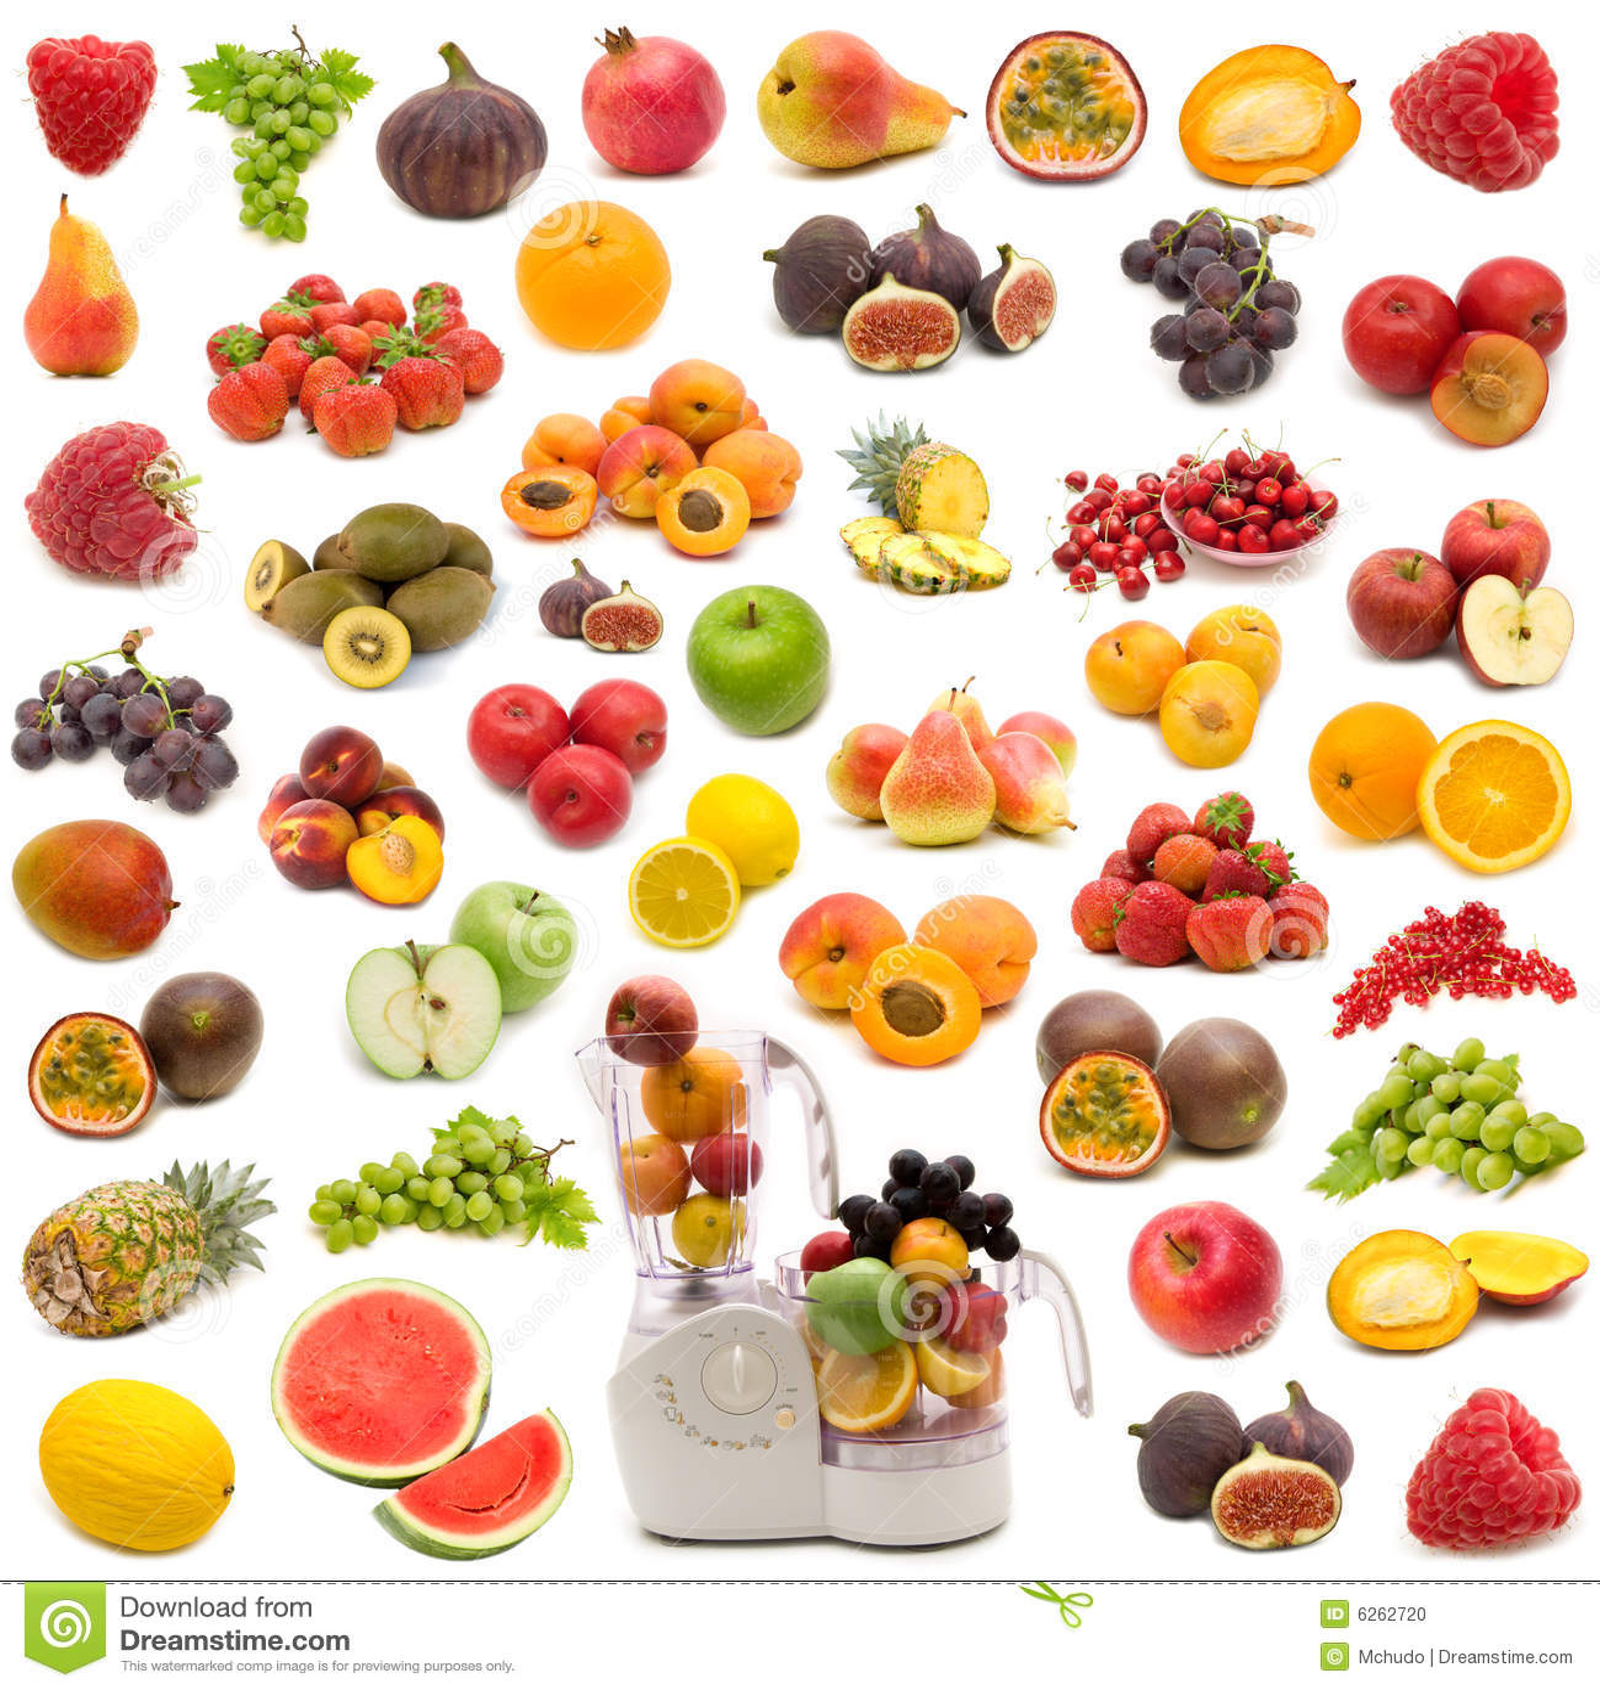 Ramassage de fruits juteux frais